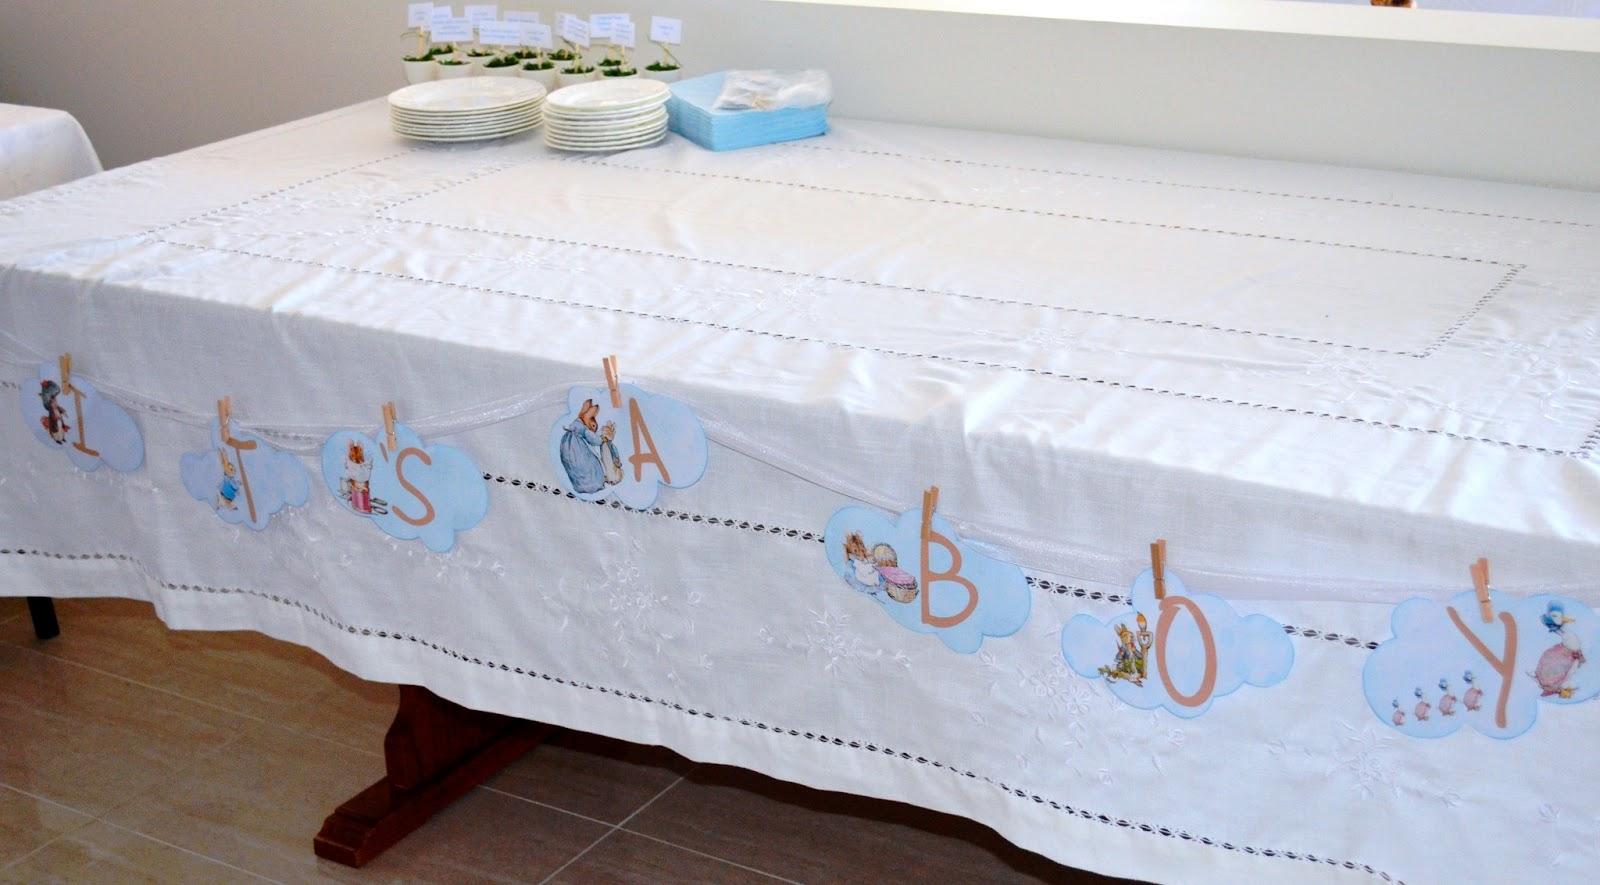 Lincraft Cake Decorating